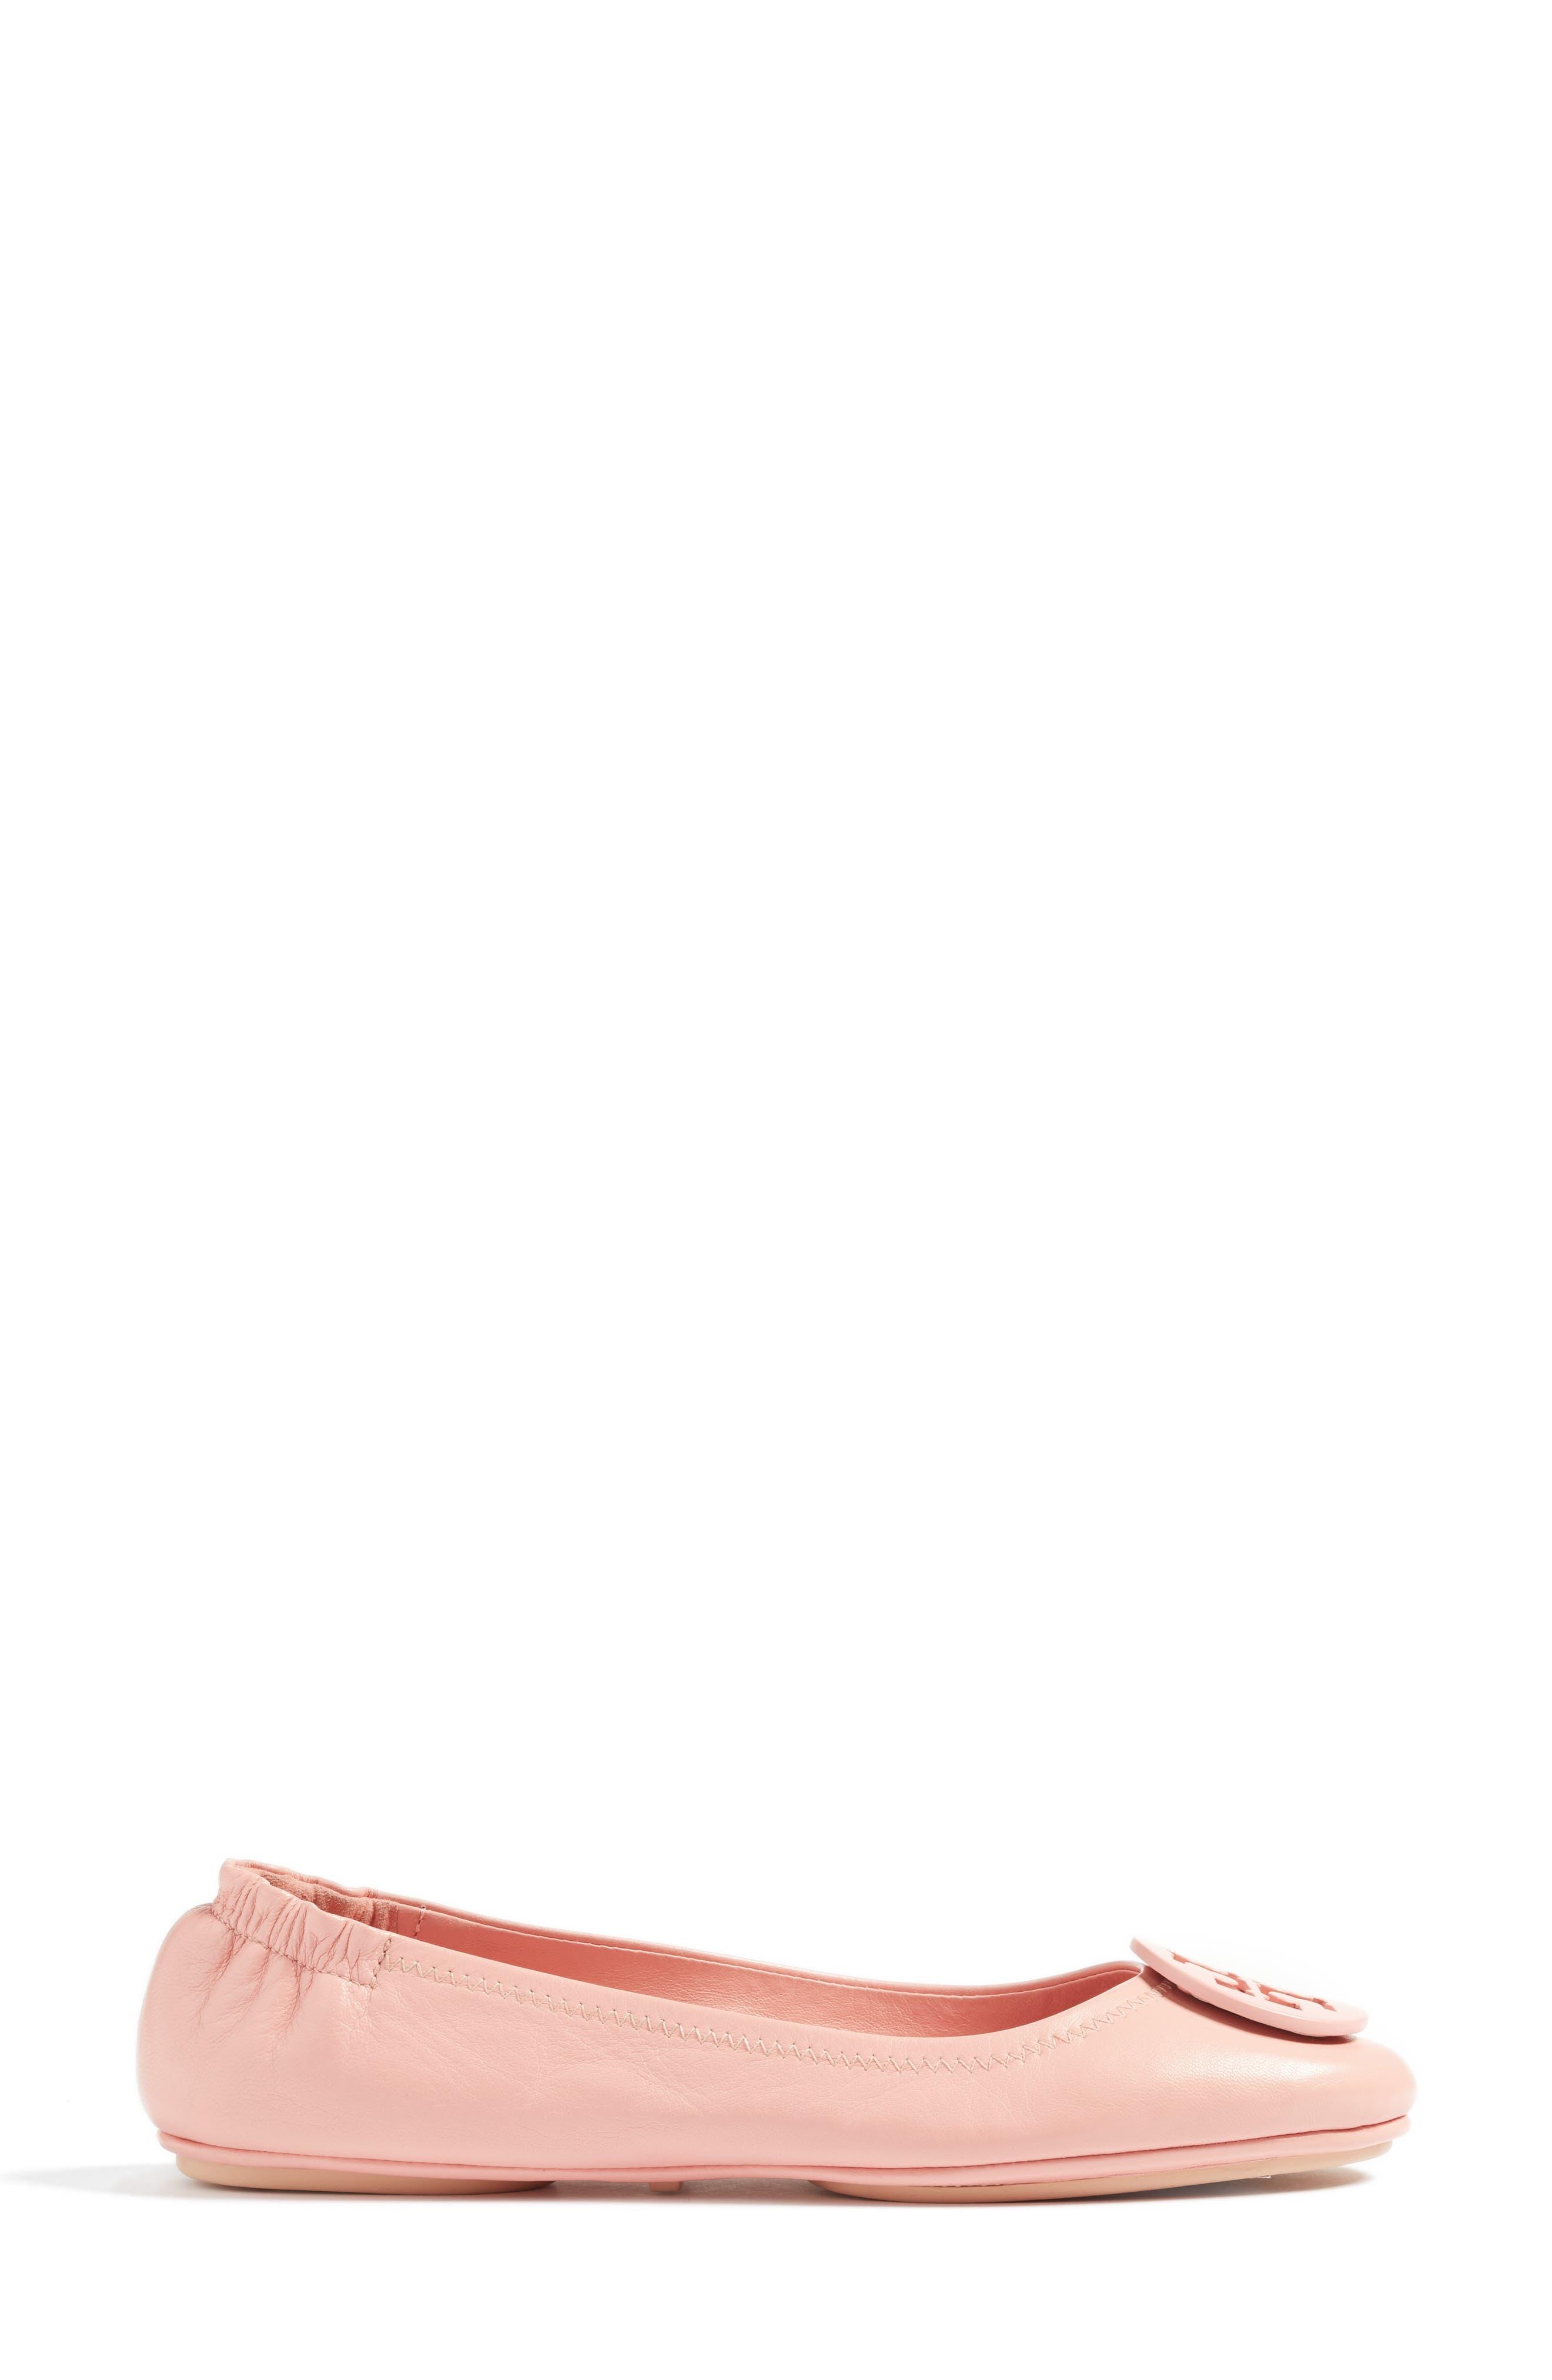 'Minnie' Travel Ballet Flat,                             Alternate thumbnail 202, color,